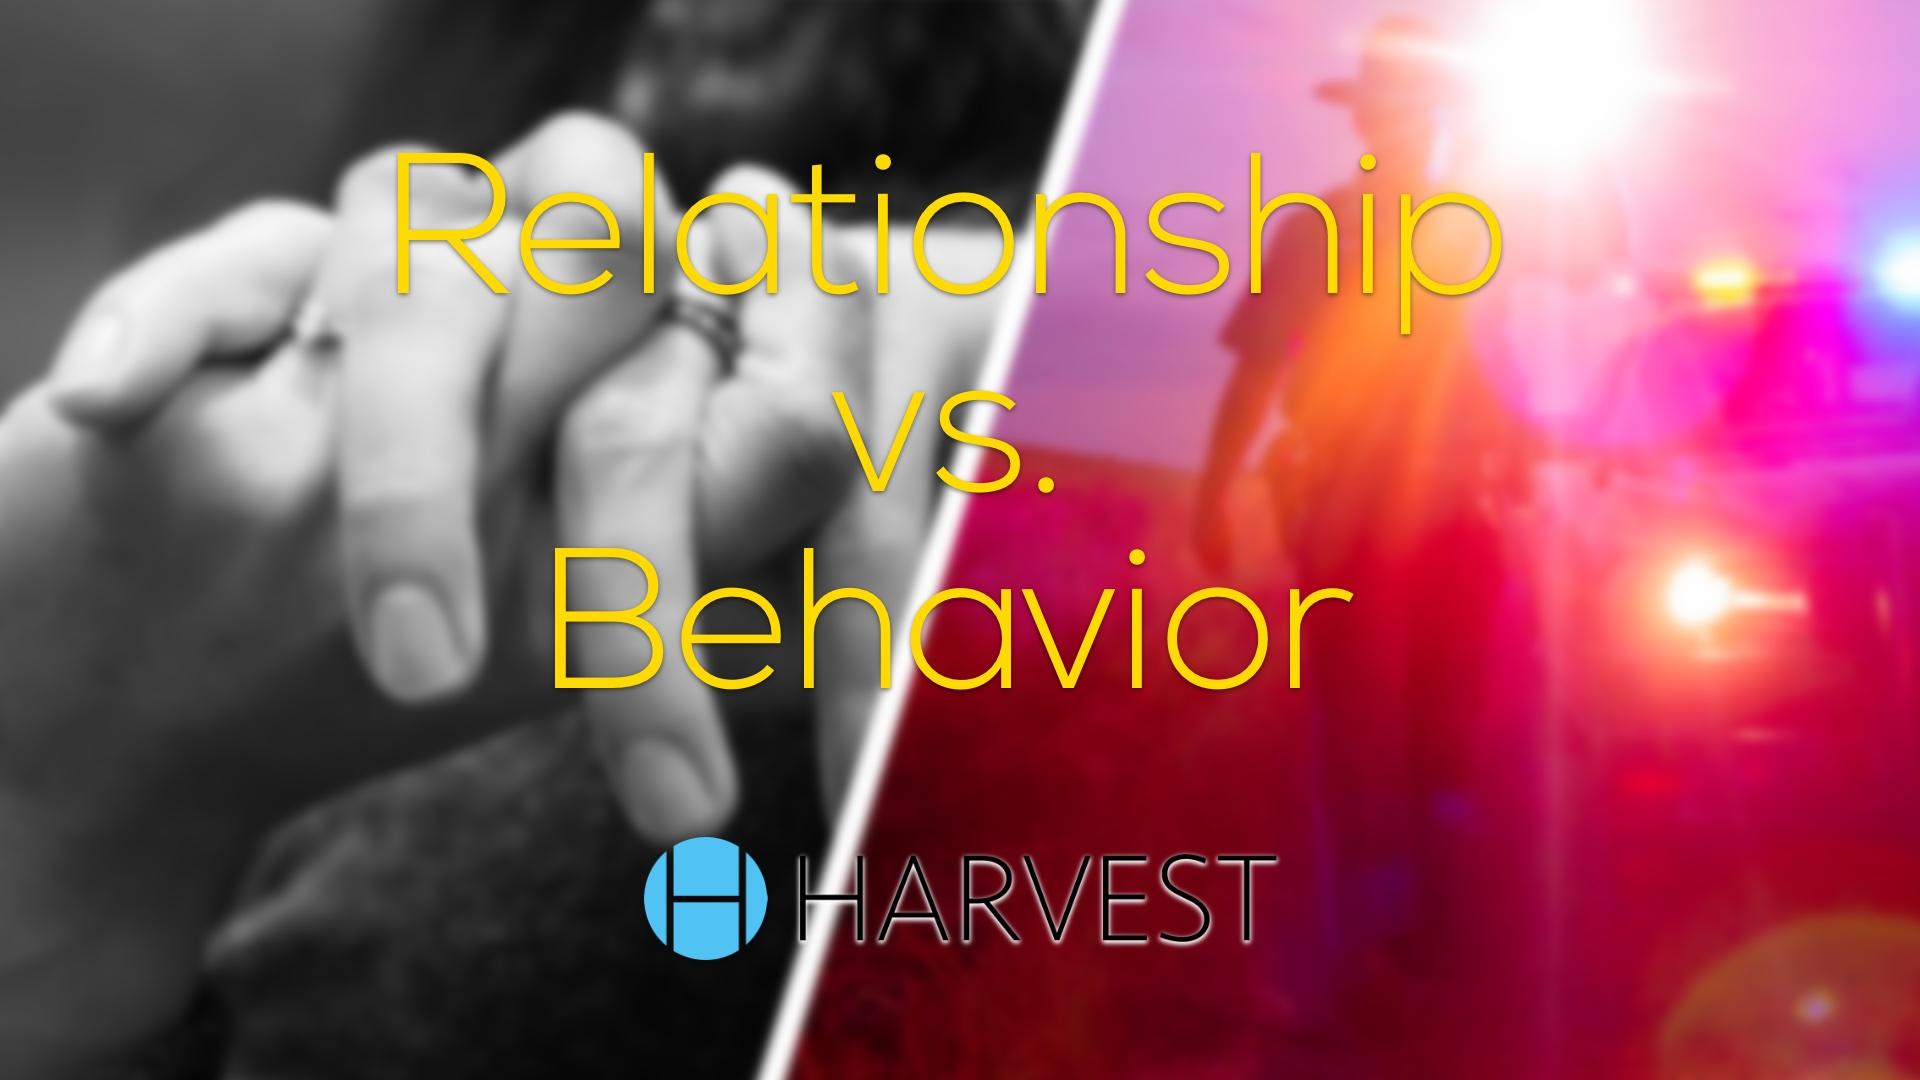 Relationship vs. Behavior